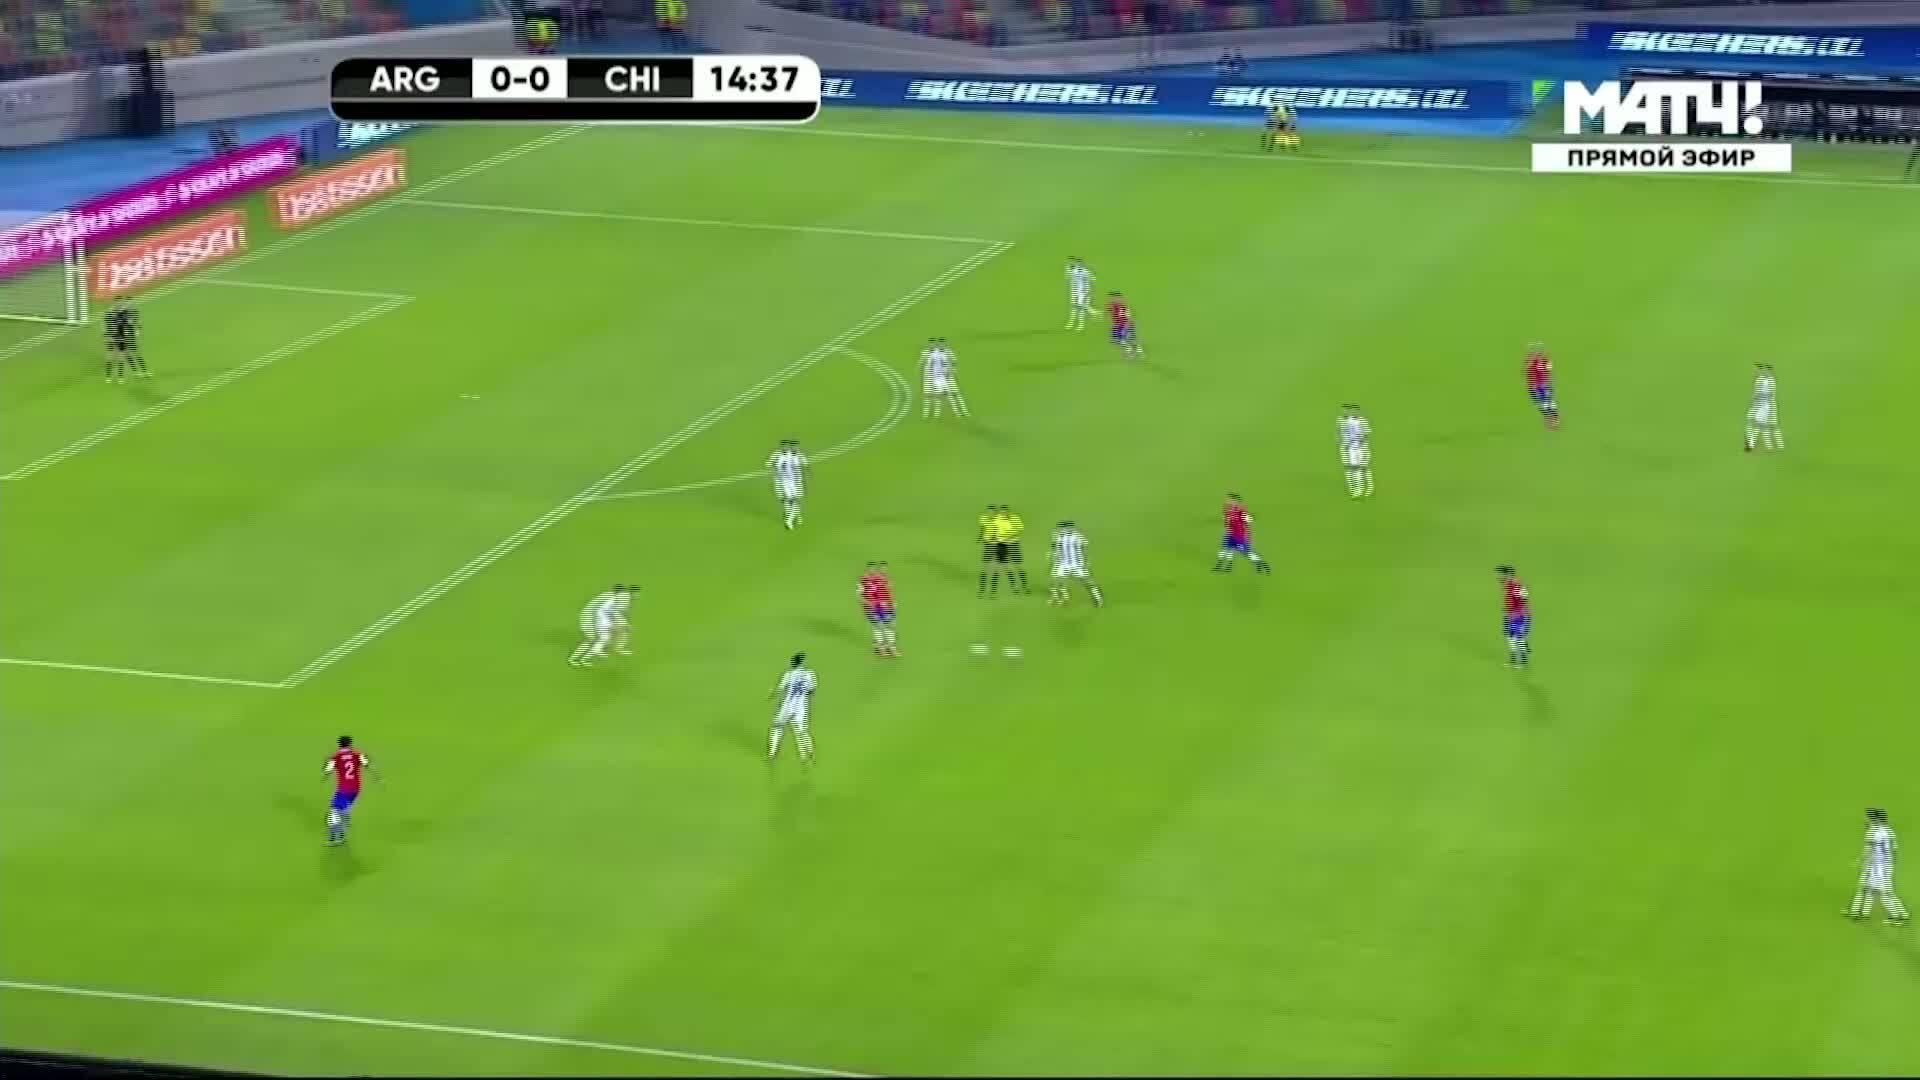 Argentina 1-1 Chile